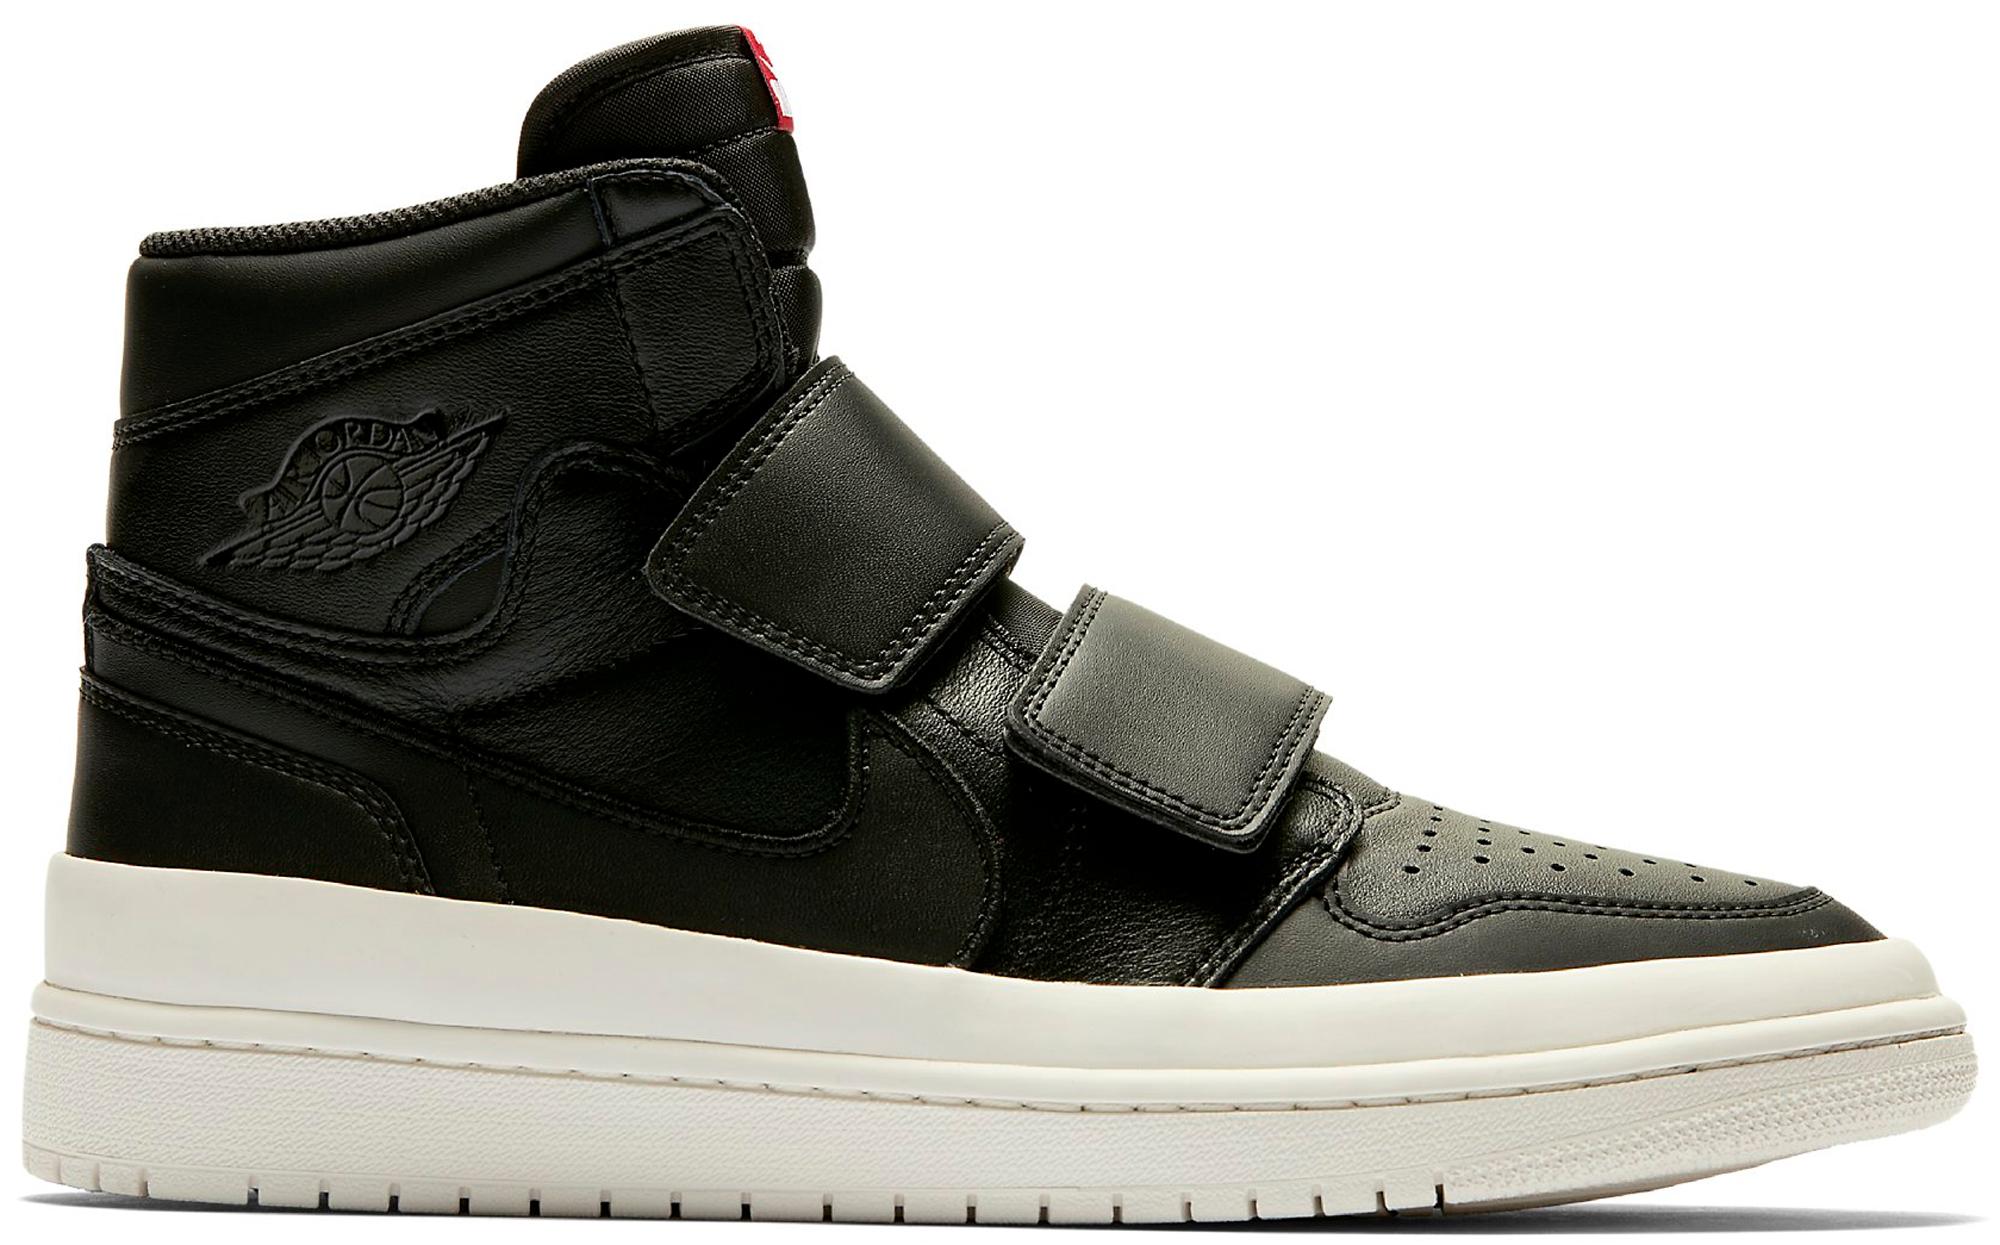 Jordan 1 Retro High Double Strap Black